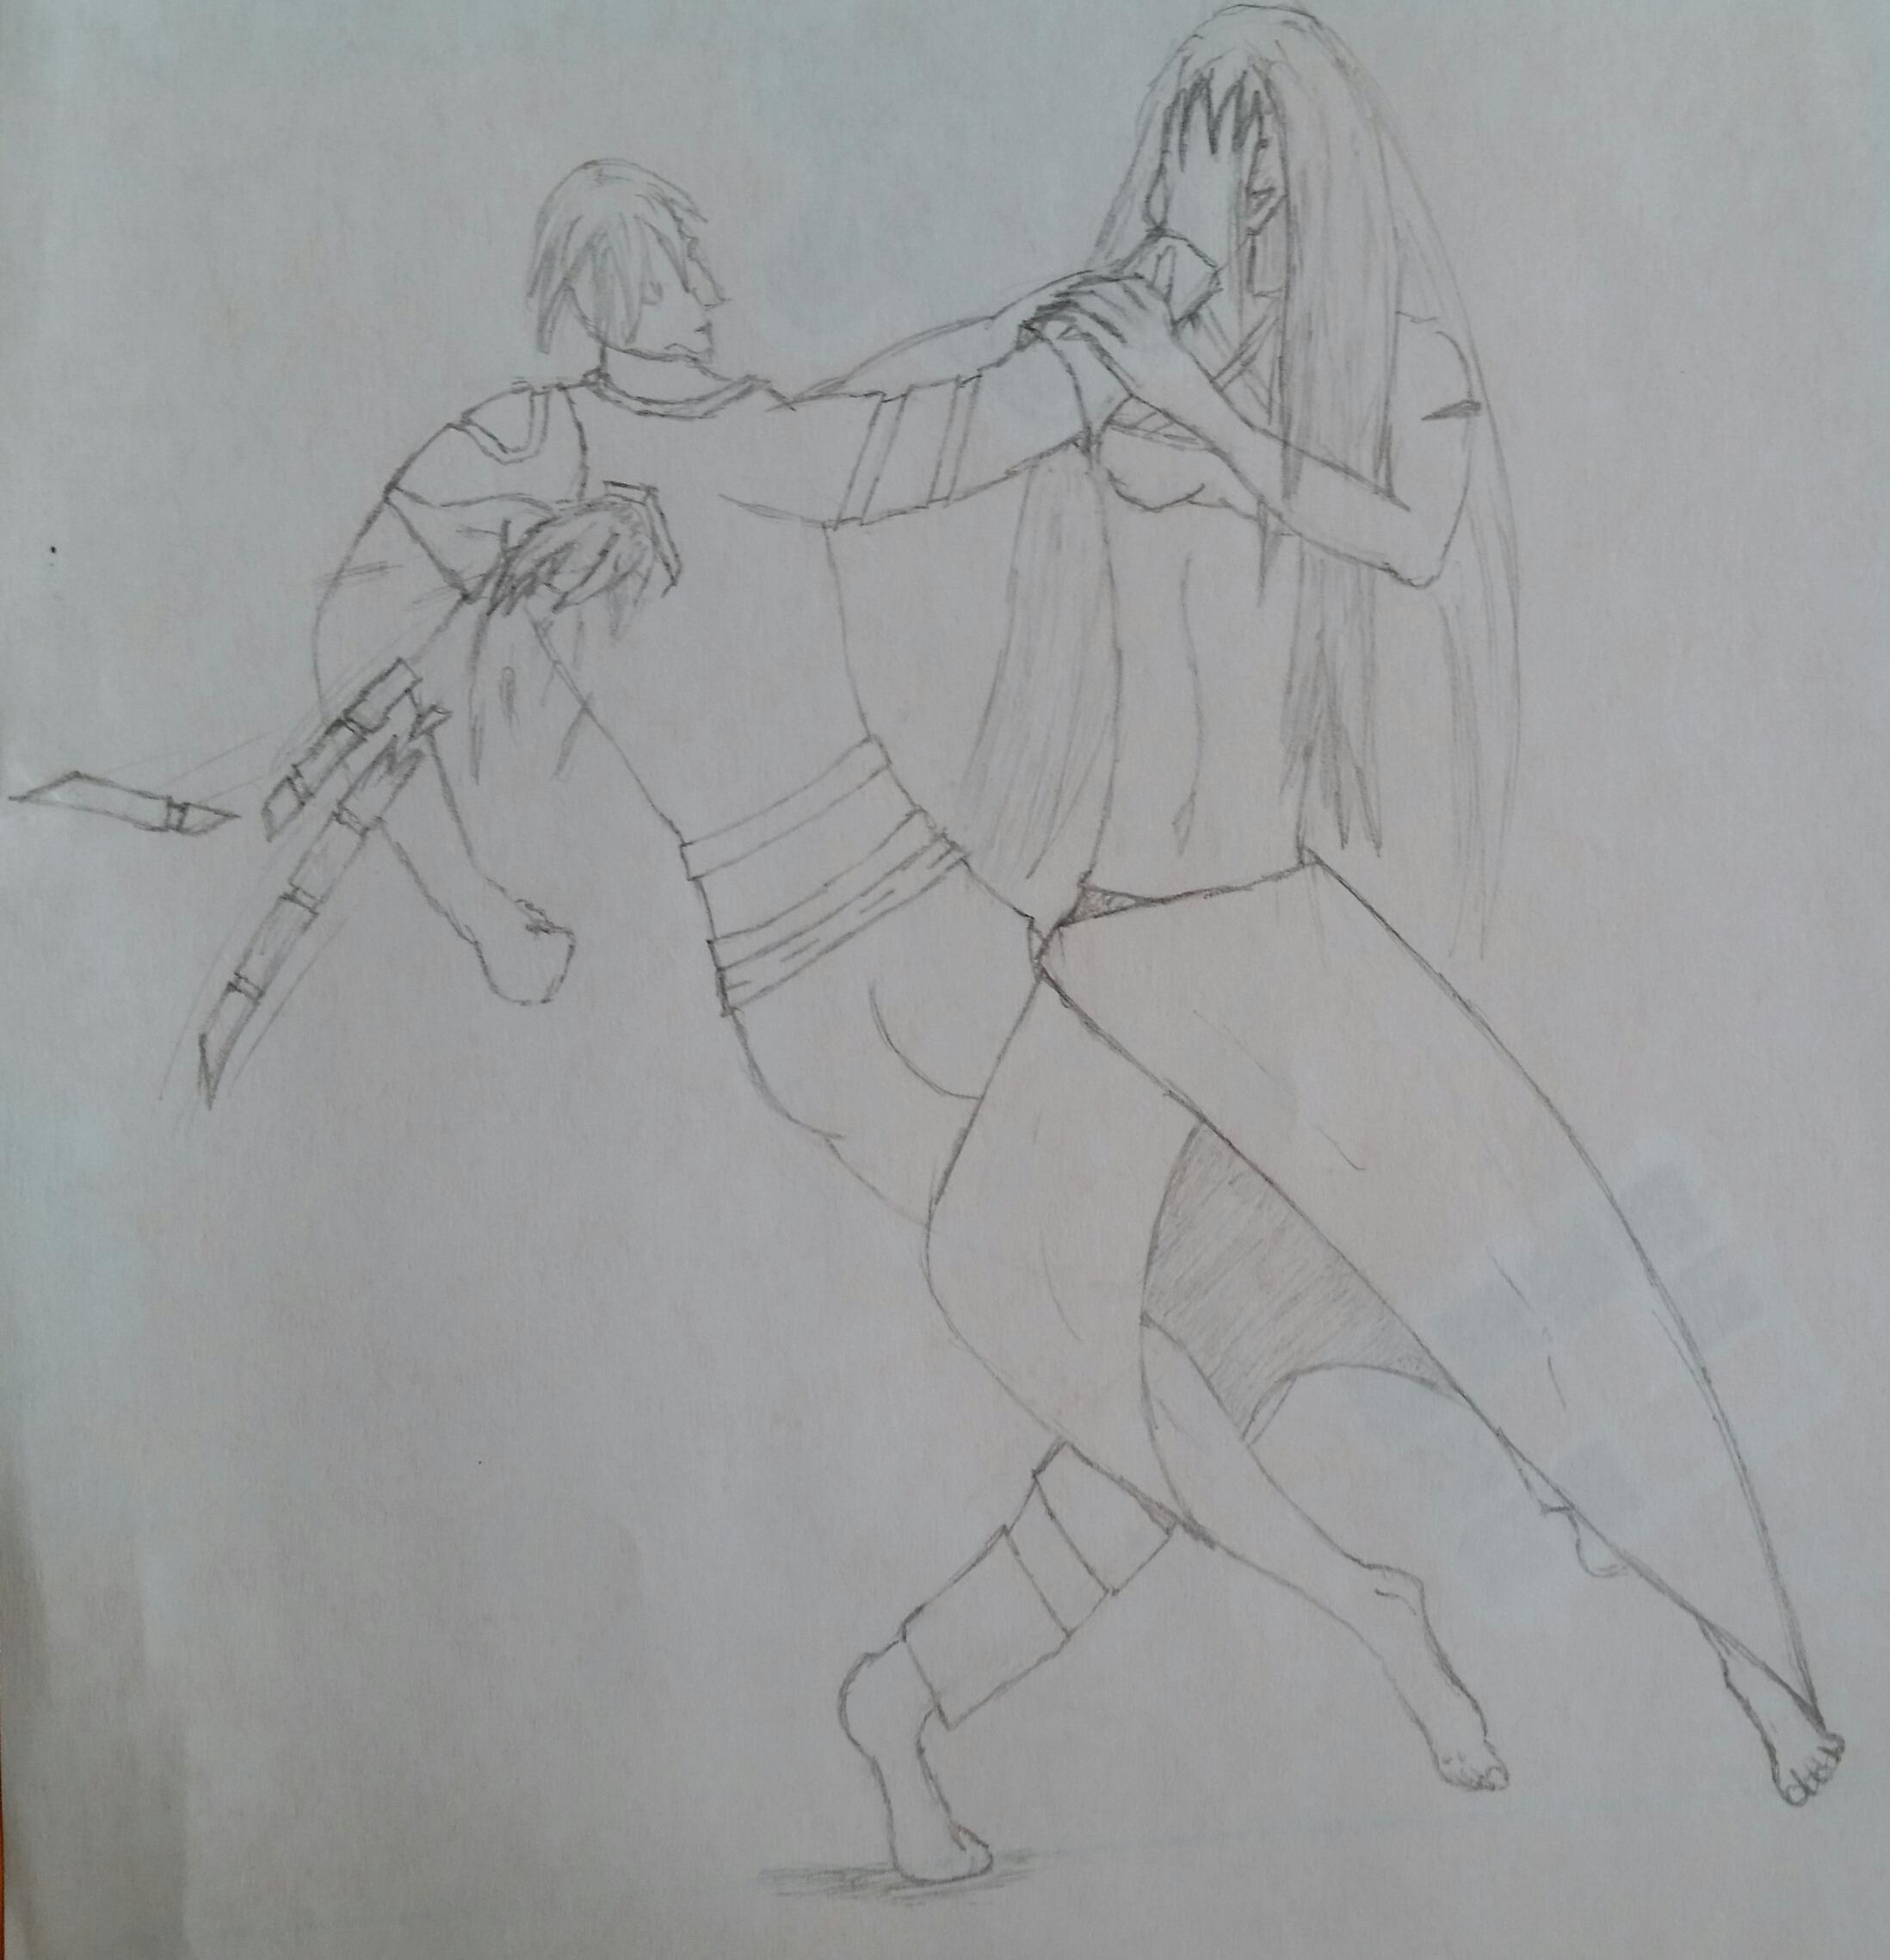 Hero(Me) Vs Villain(Friend) by saiyankev